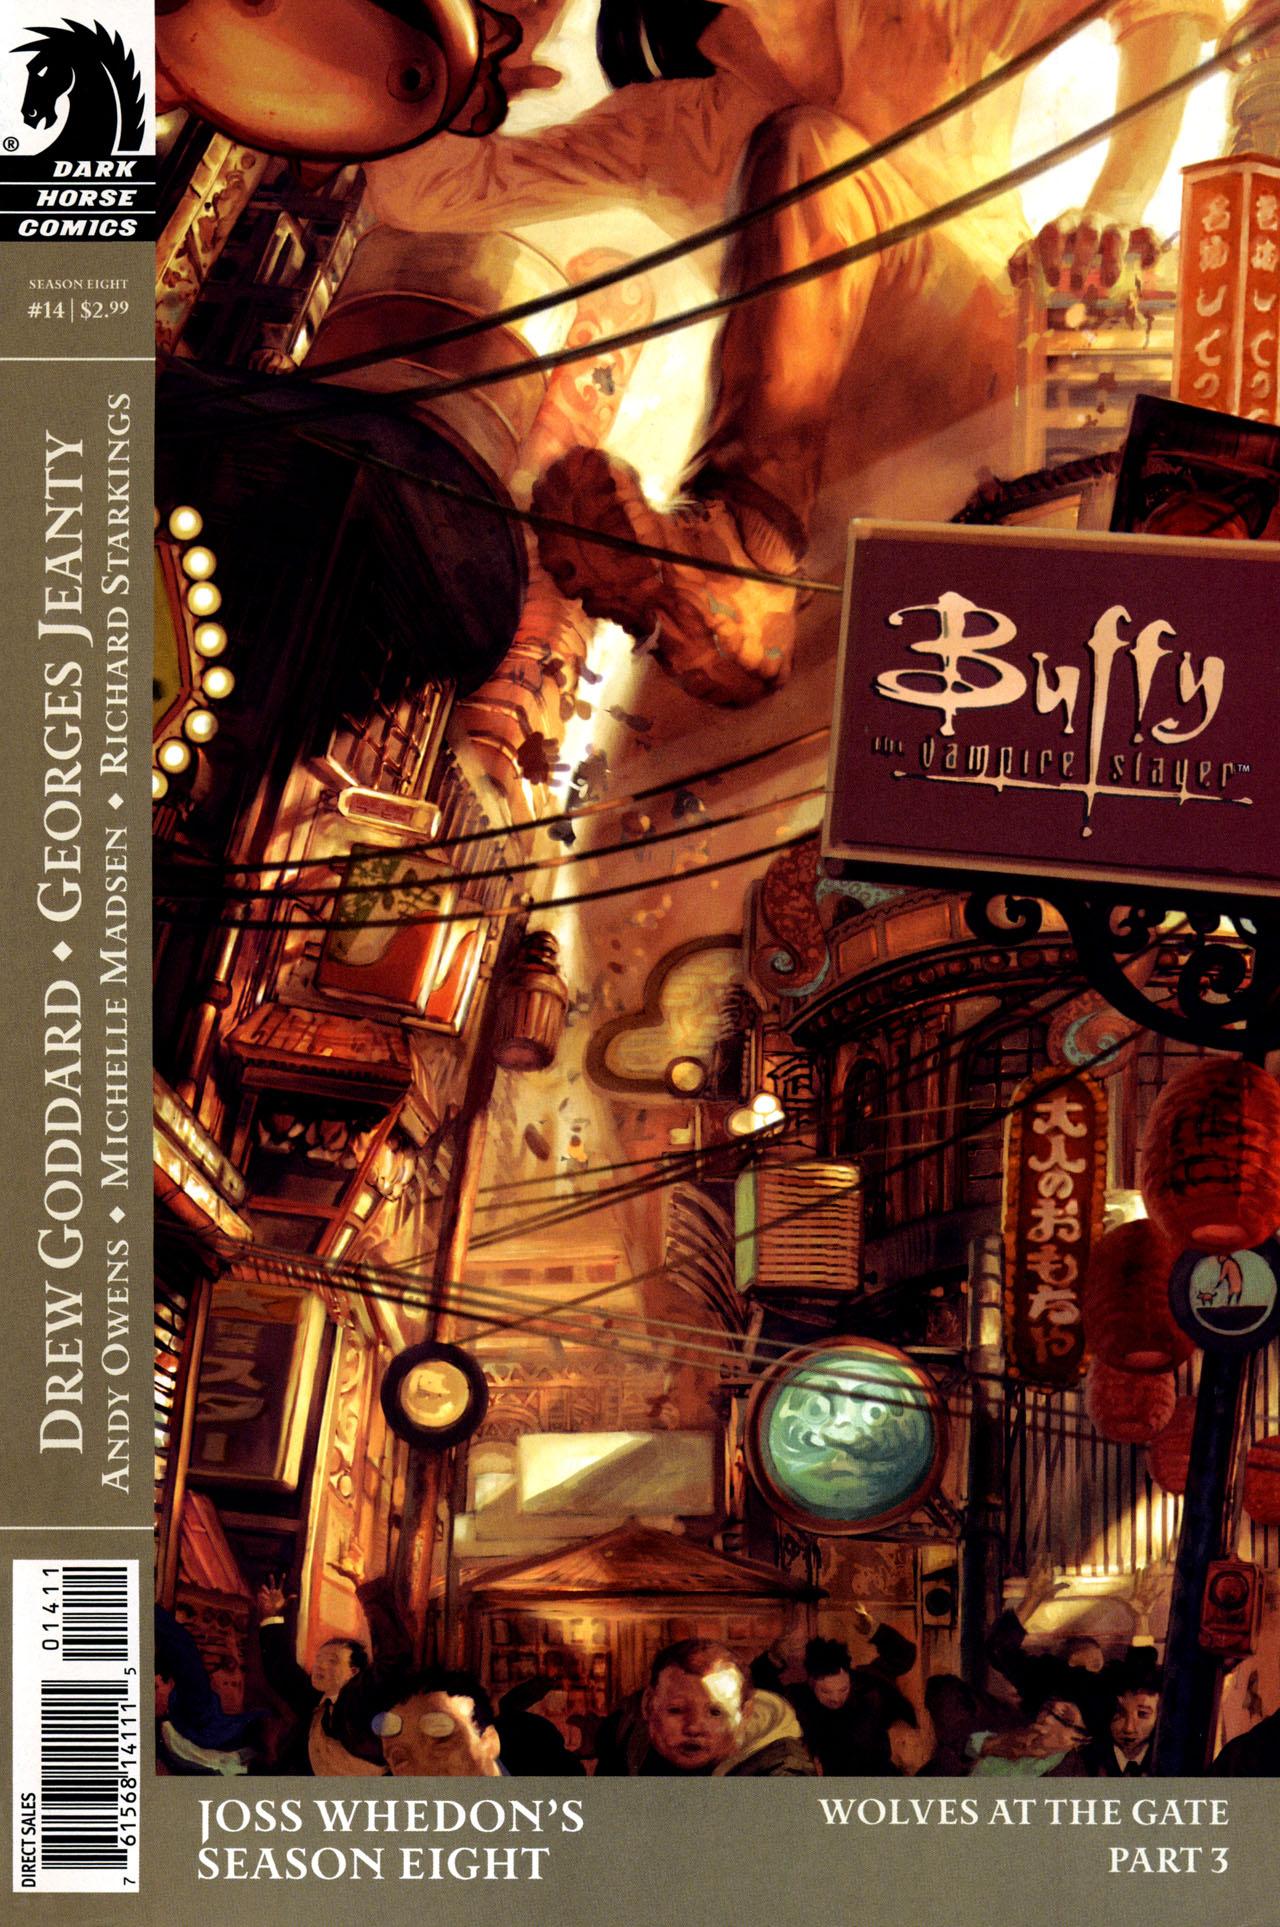 Buffy the Vampire Slayer Season Eight 14 Page 1